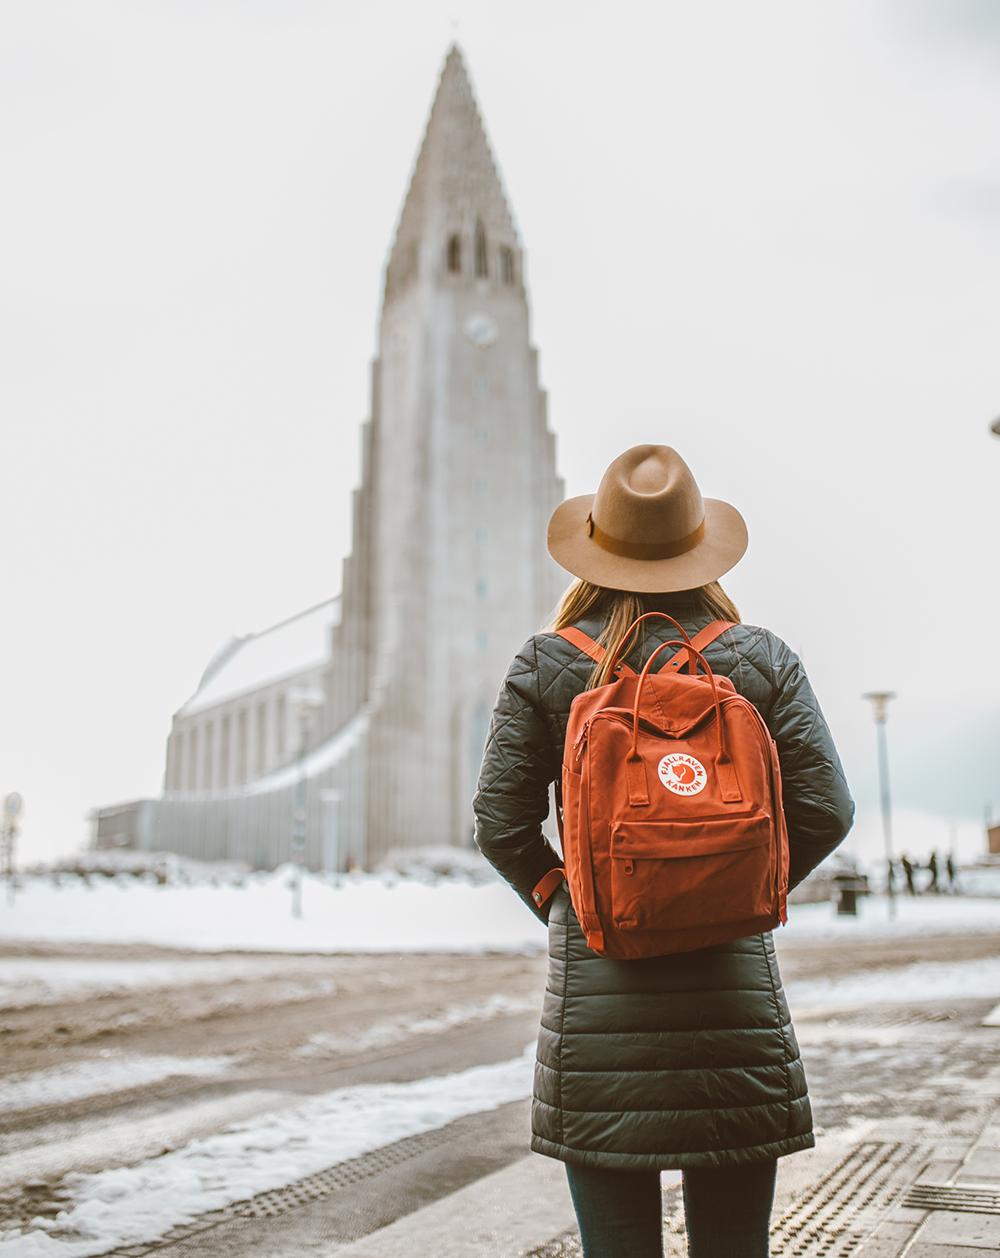 livvyland-blog-olivia-watson-travel-lifestyle-blogger-iceland-road-trip-what-to-do-pack-reykjavik-noken-travel-guide-Hallgrimskirkja-church-8